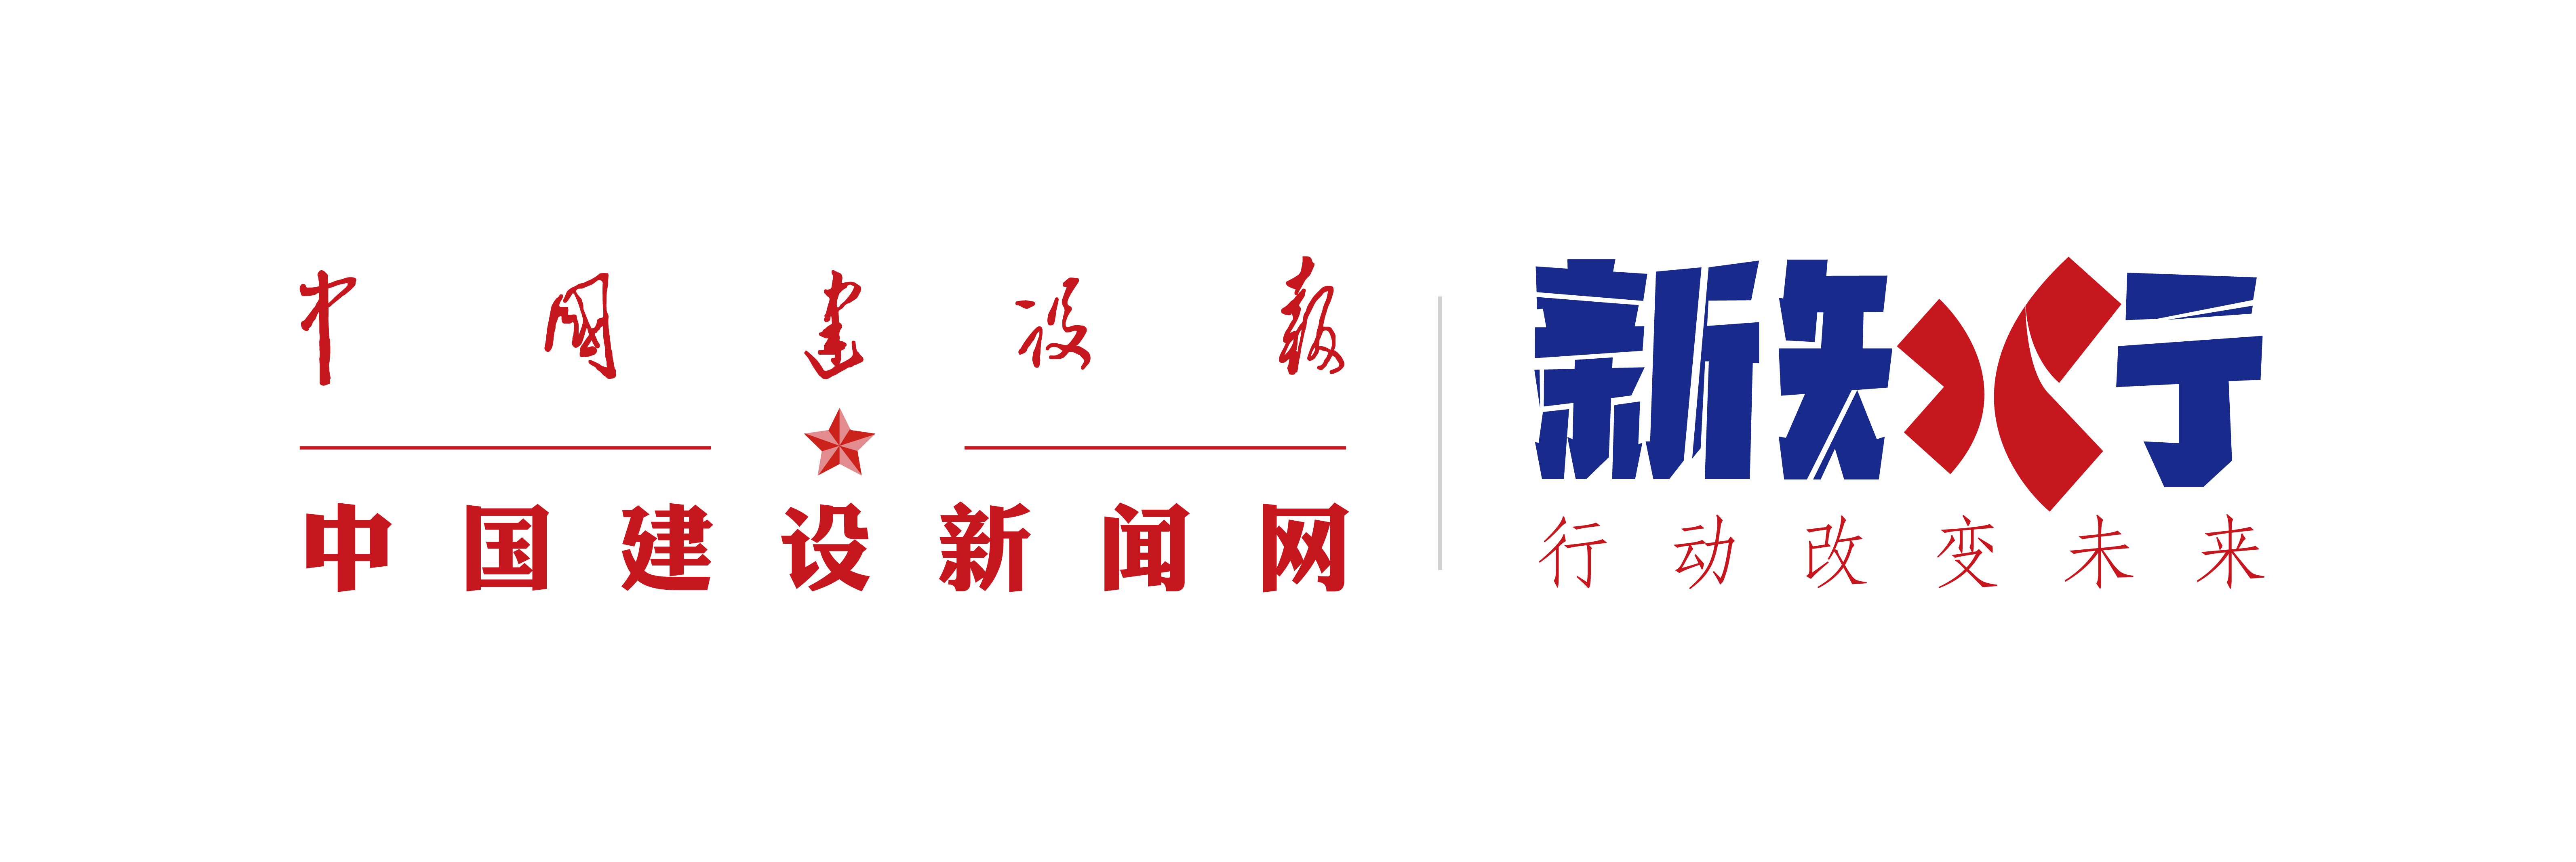 新知行logo设计_画板 1.png